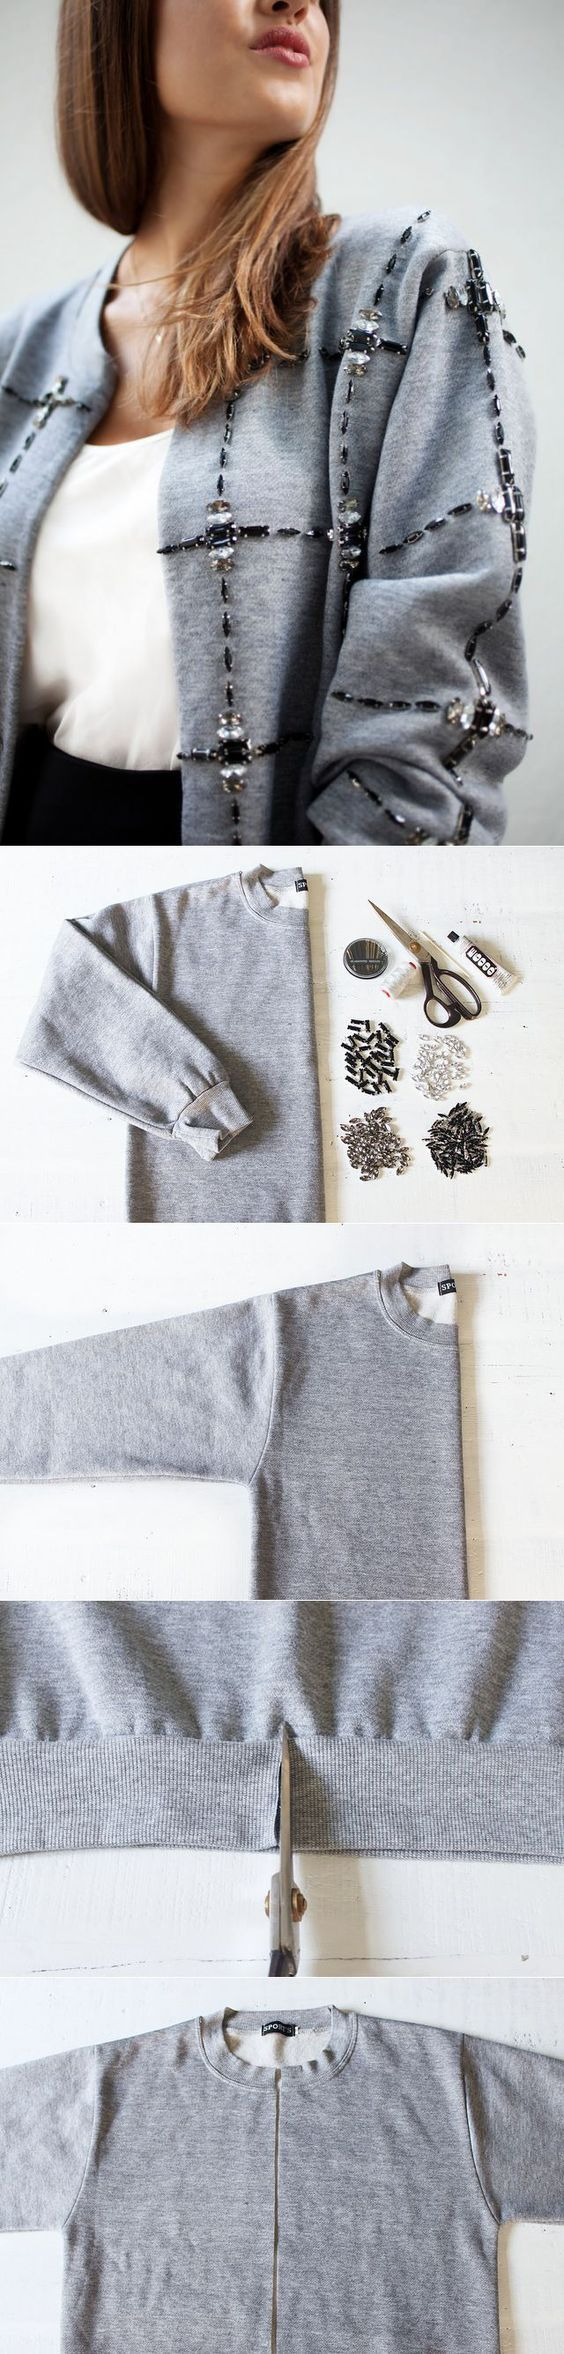 Take a plain old sweatshirt to the next level, a diamond cardigan. DIY FASHION PROJECT! <3 @benitathediva: